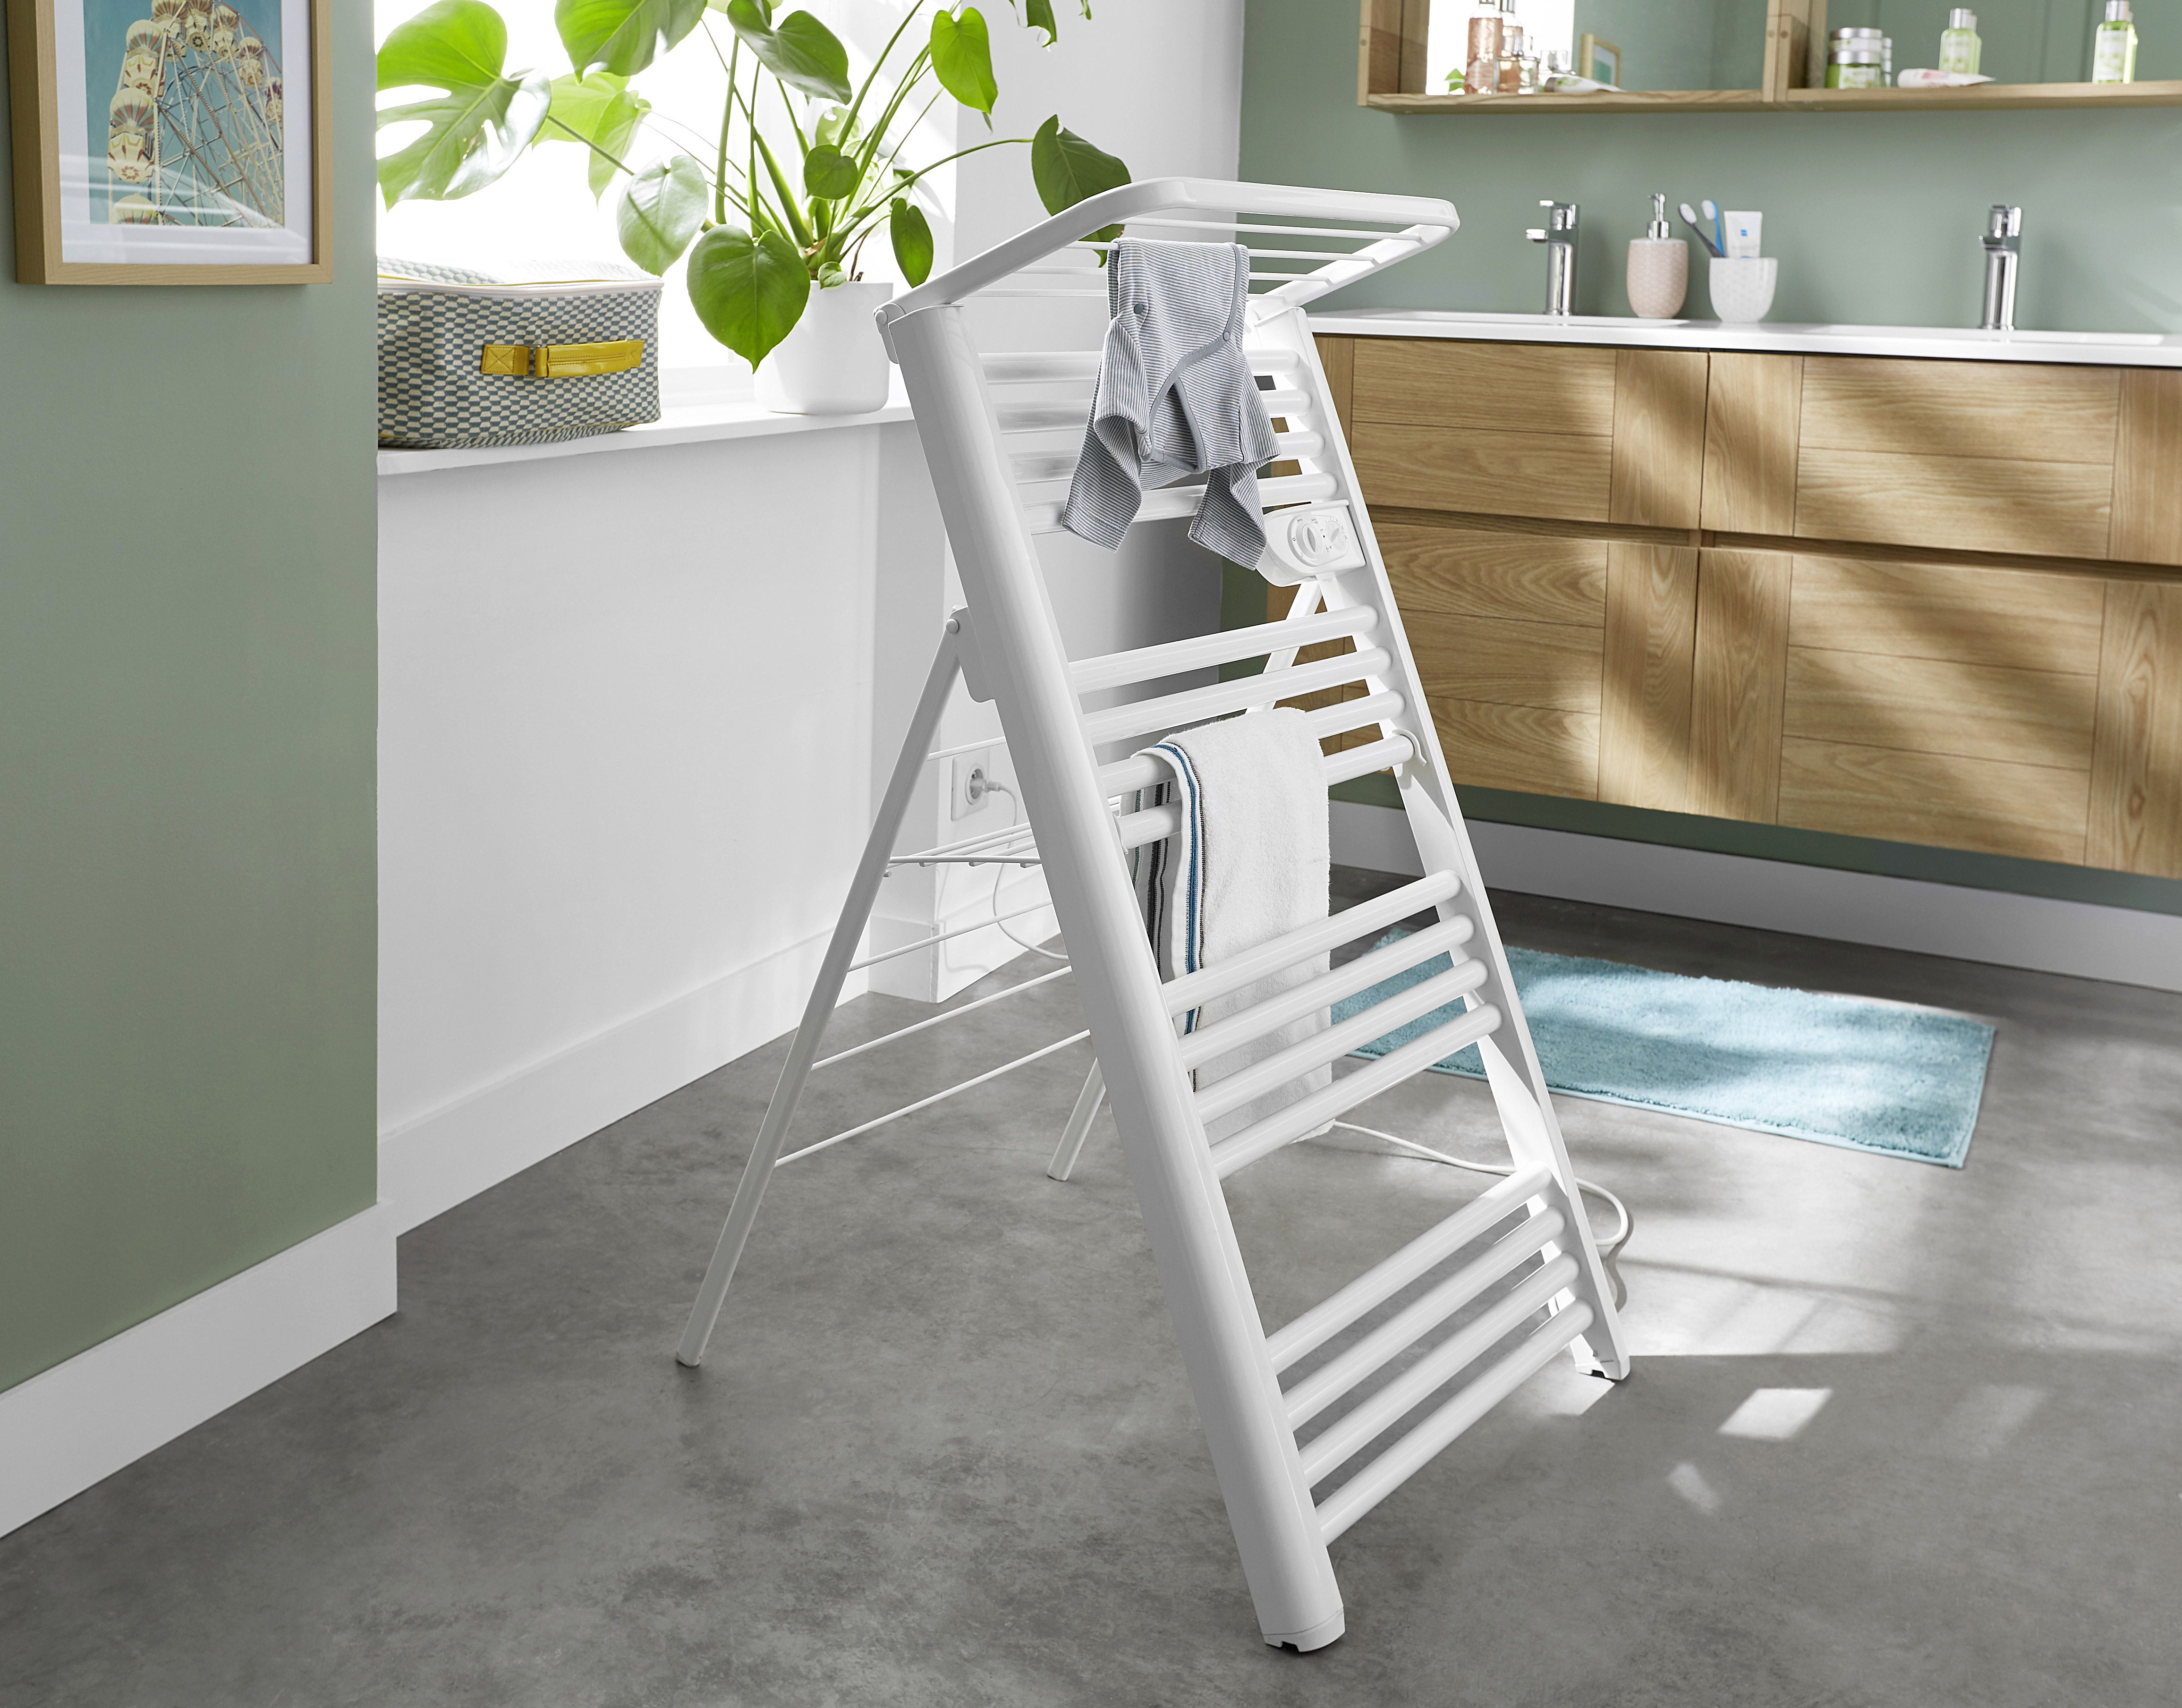 Suszarka Elektryczna Blyss 500 W White Towels Towel Warmer Scandinavian Kitchen